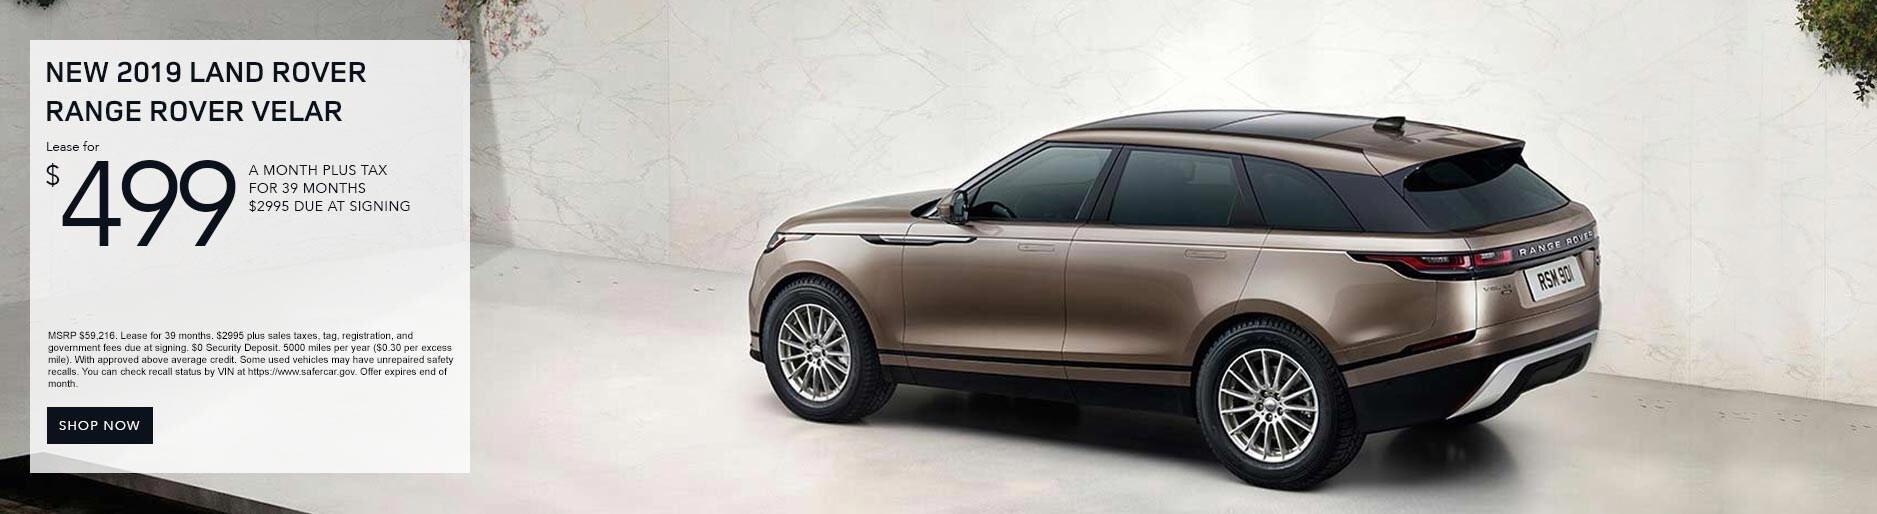 Lease A Car Near Me >> Land Rover White Plains Land Rover Dealership Near Me Elmsford Ny